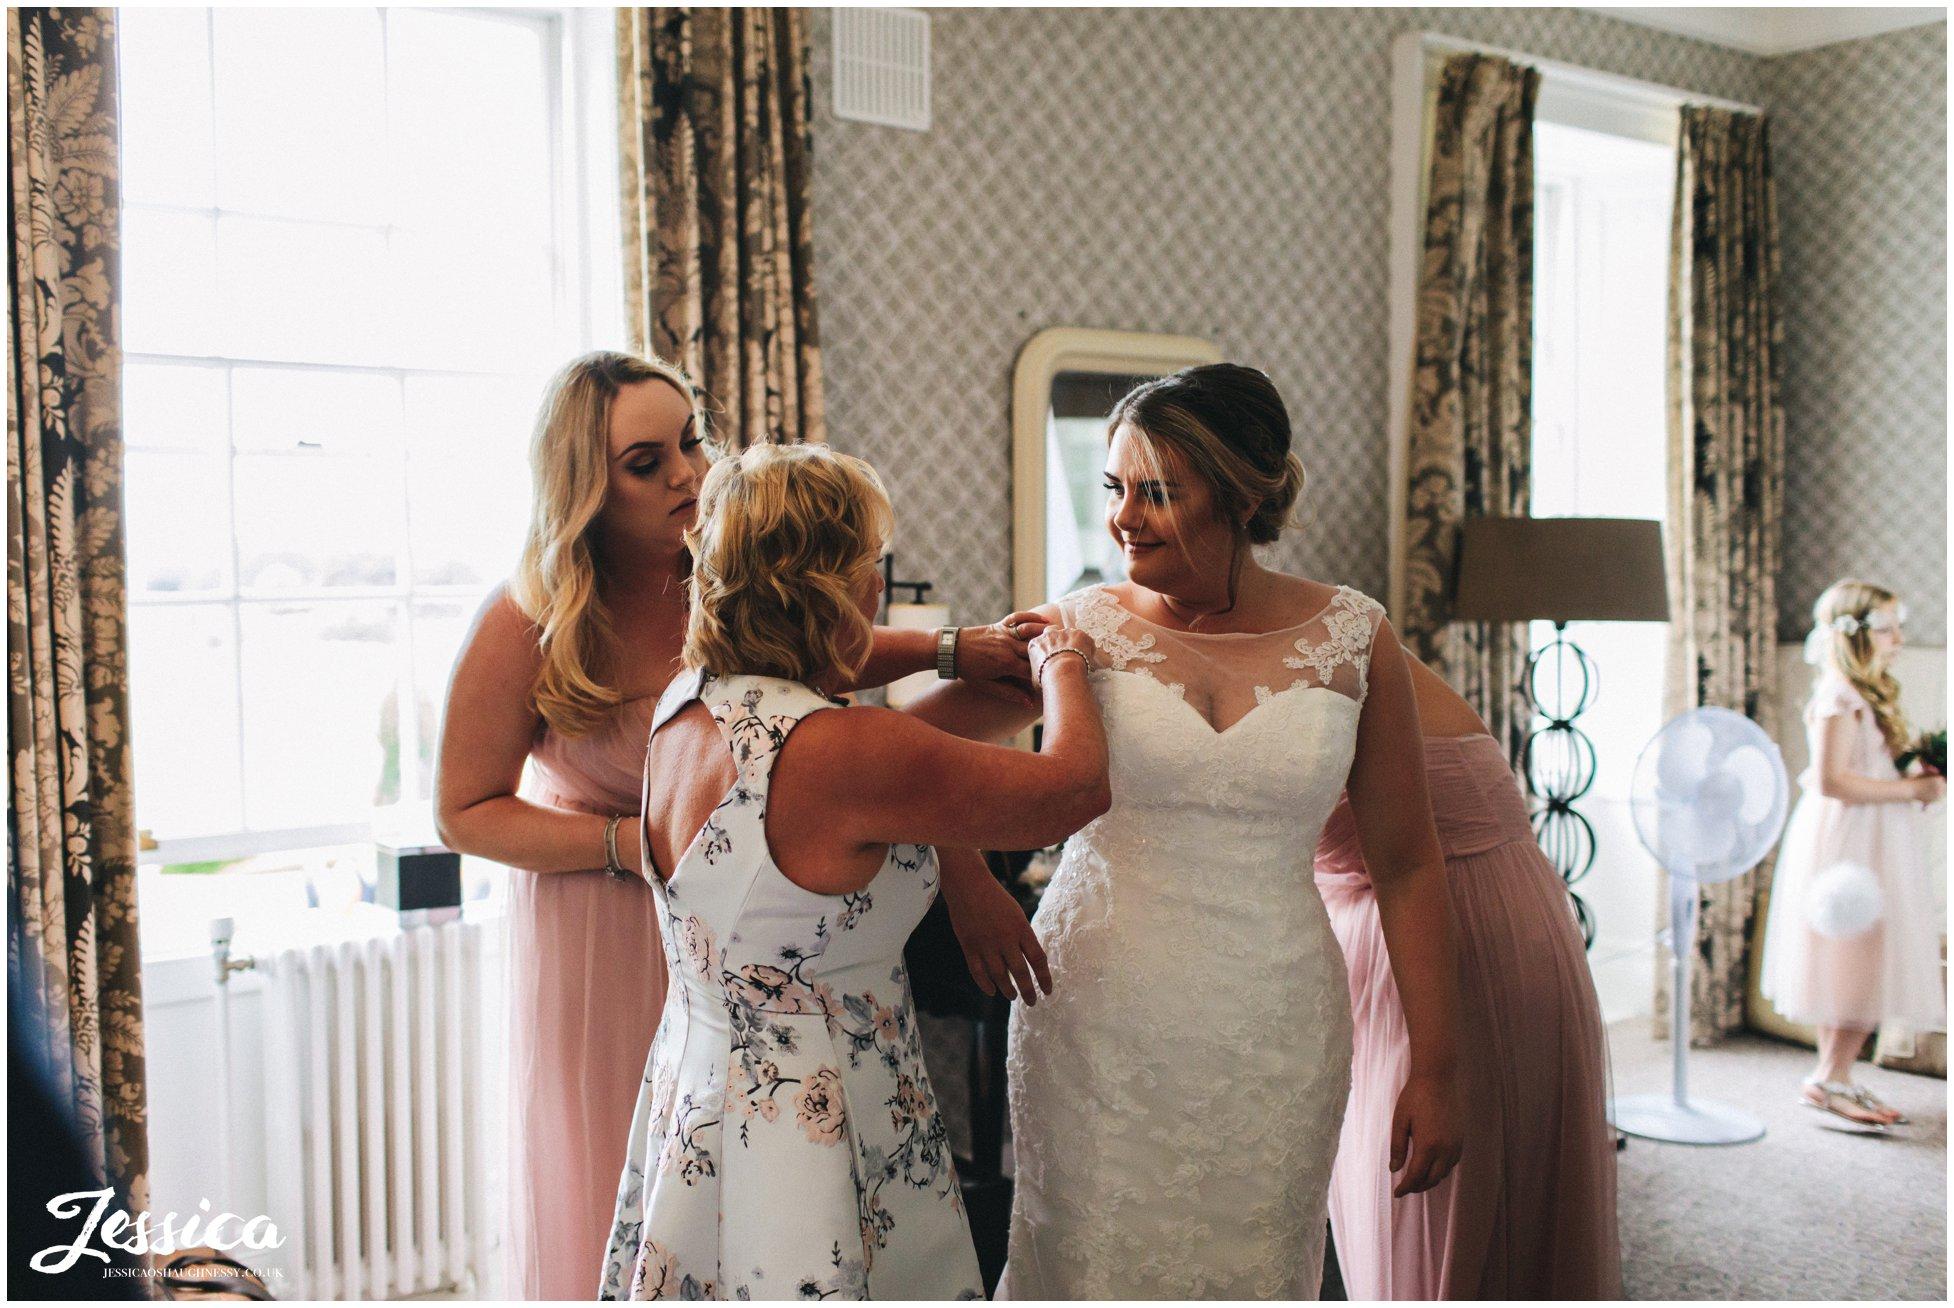 bridesmaids help the bride into her wedding dress at mottram hall